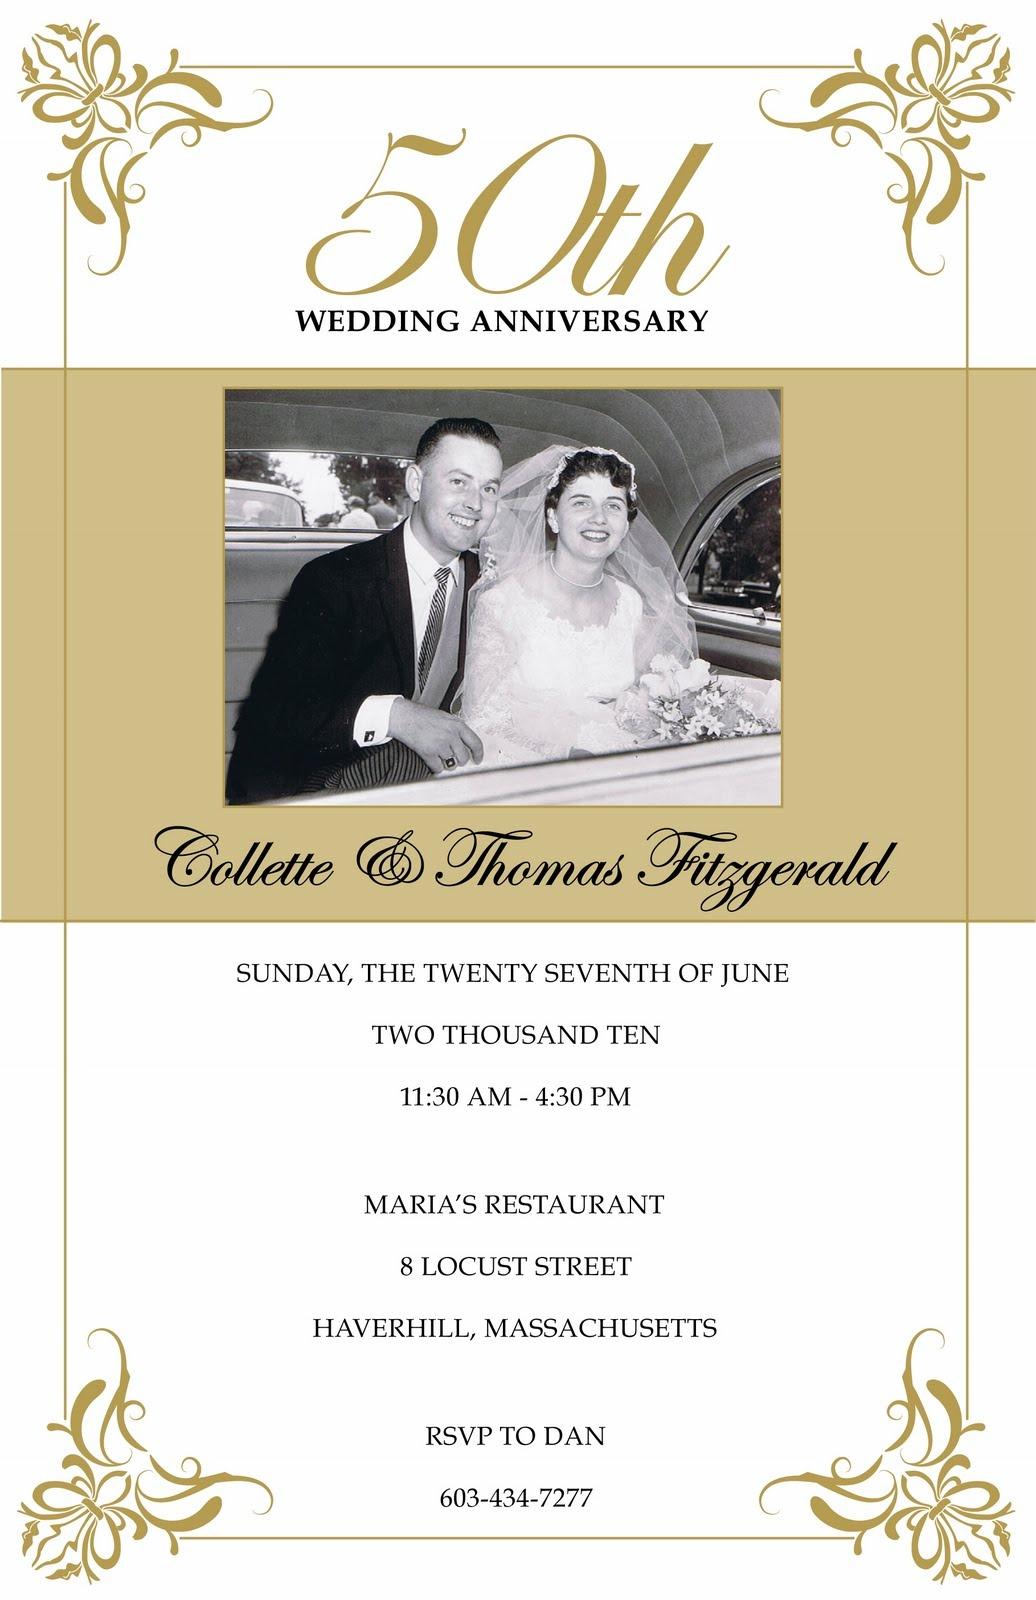 Free Anniversary Invitation Cliparts, Download Free Clip Art, Free - Free Printable 50Th Wedding Anniversary Invitation Templates